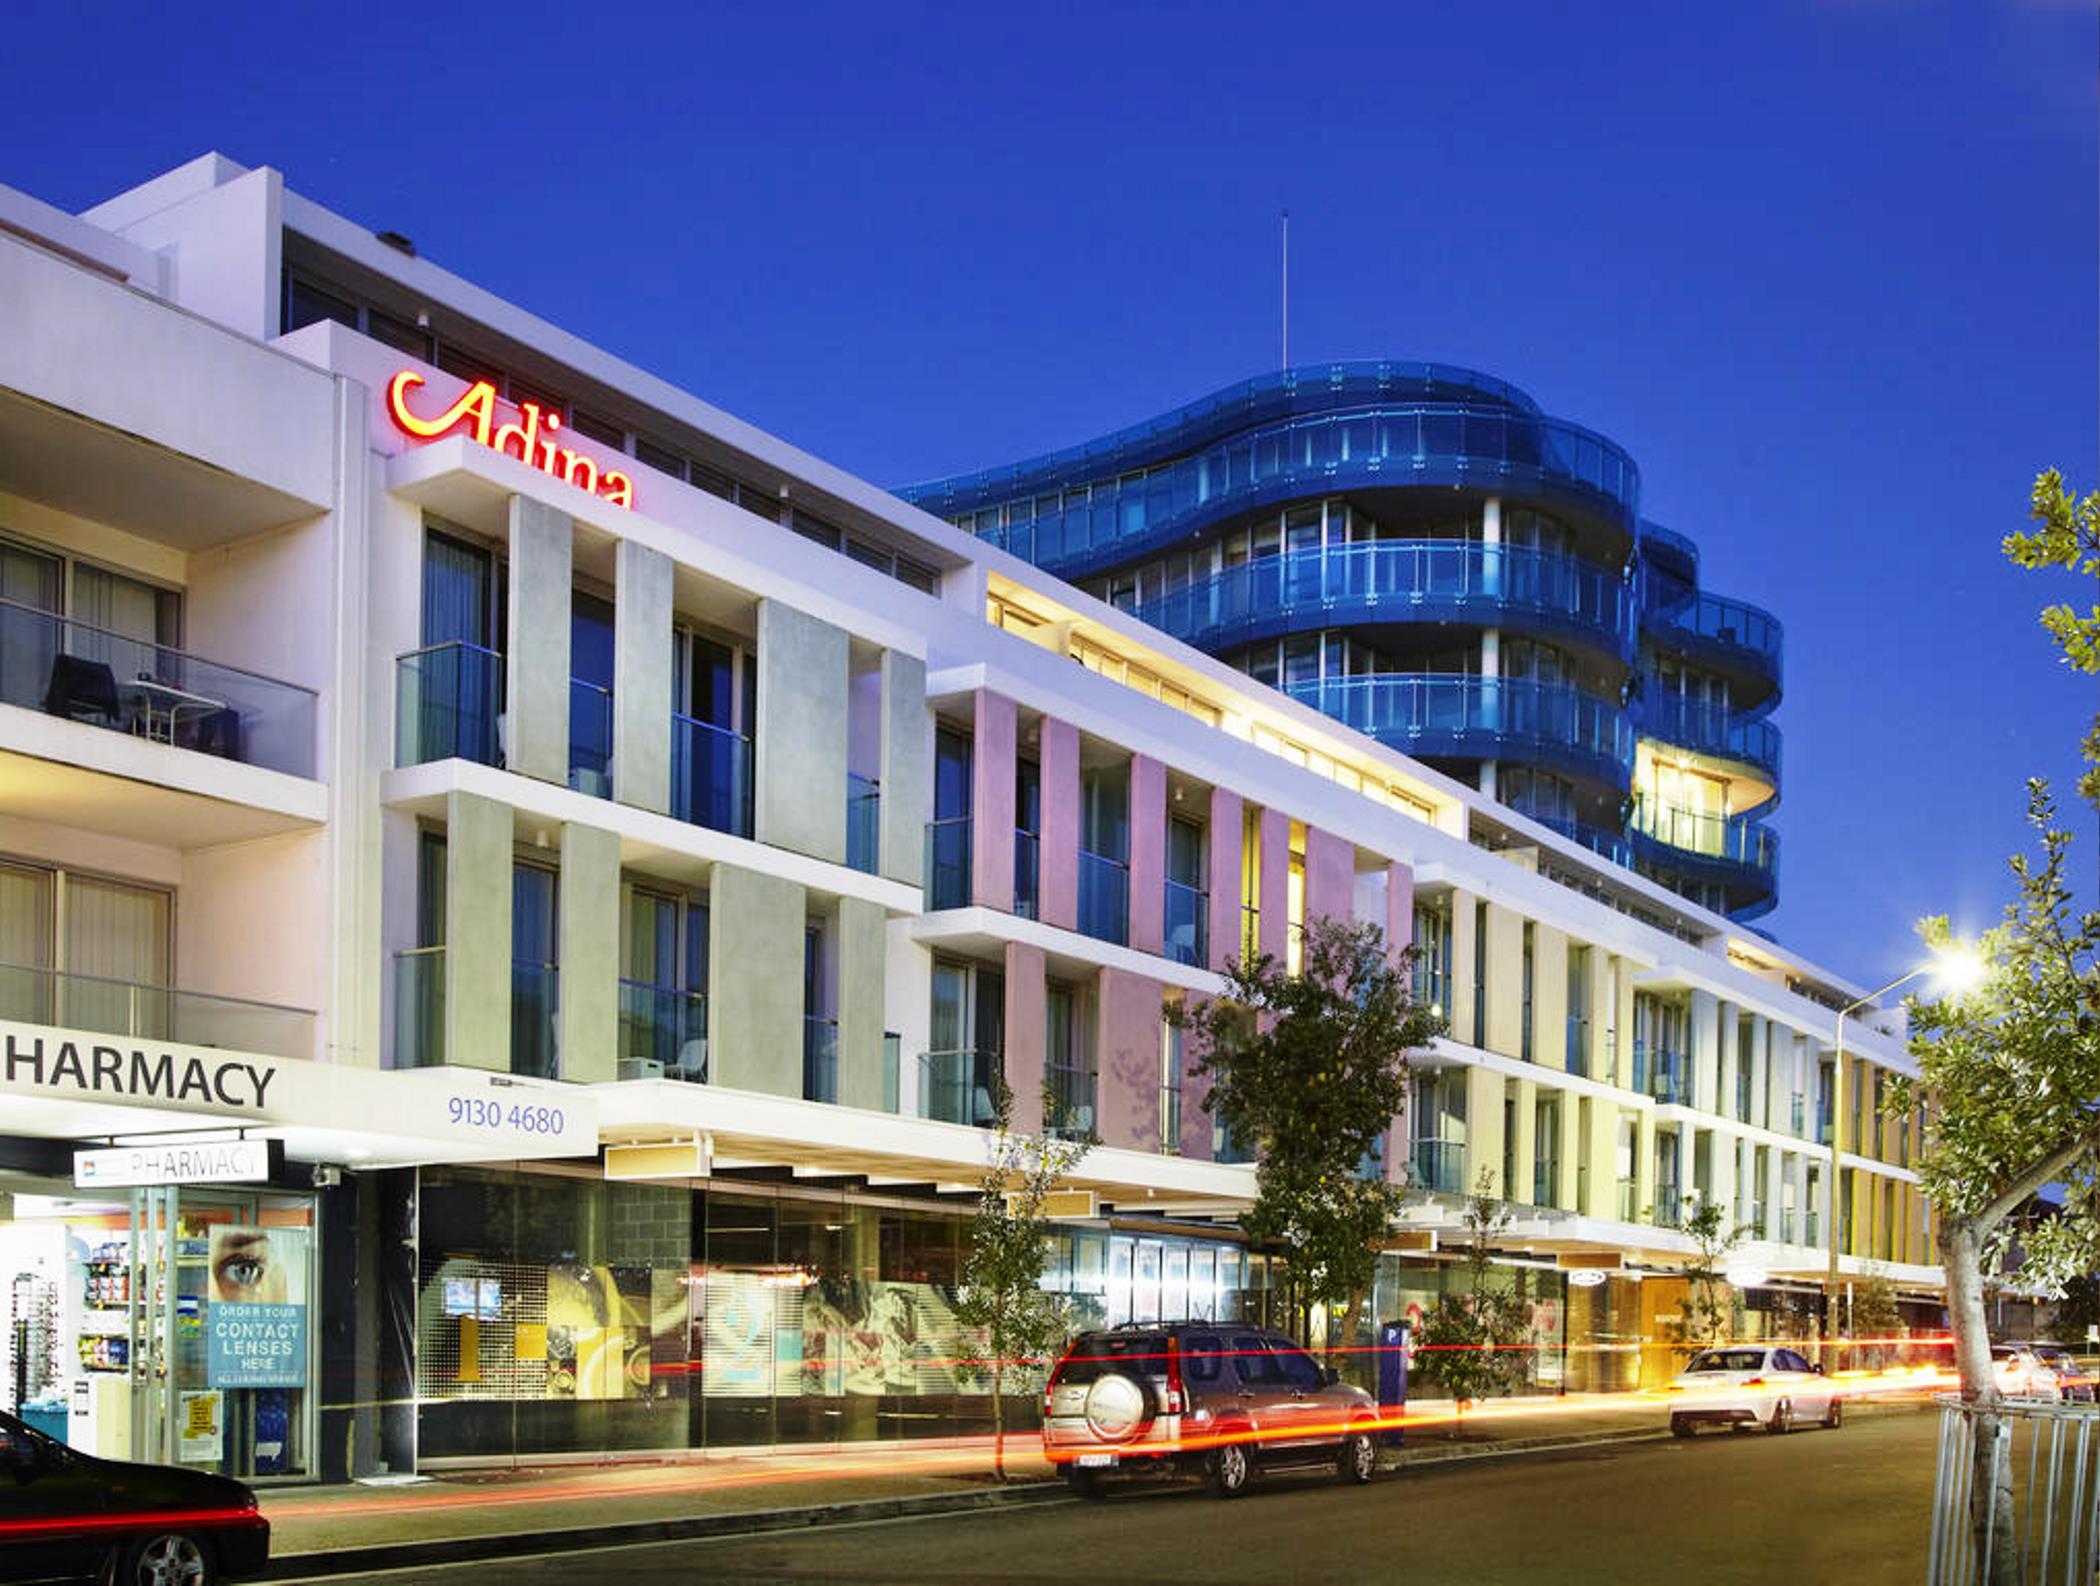 Adina Apartment Hotel, Bondi Beach, Waverley